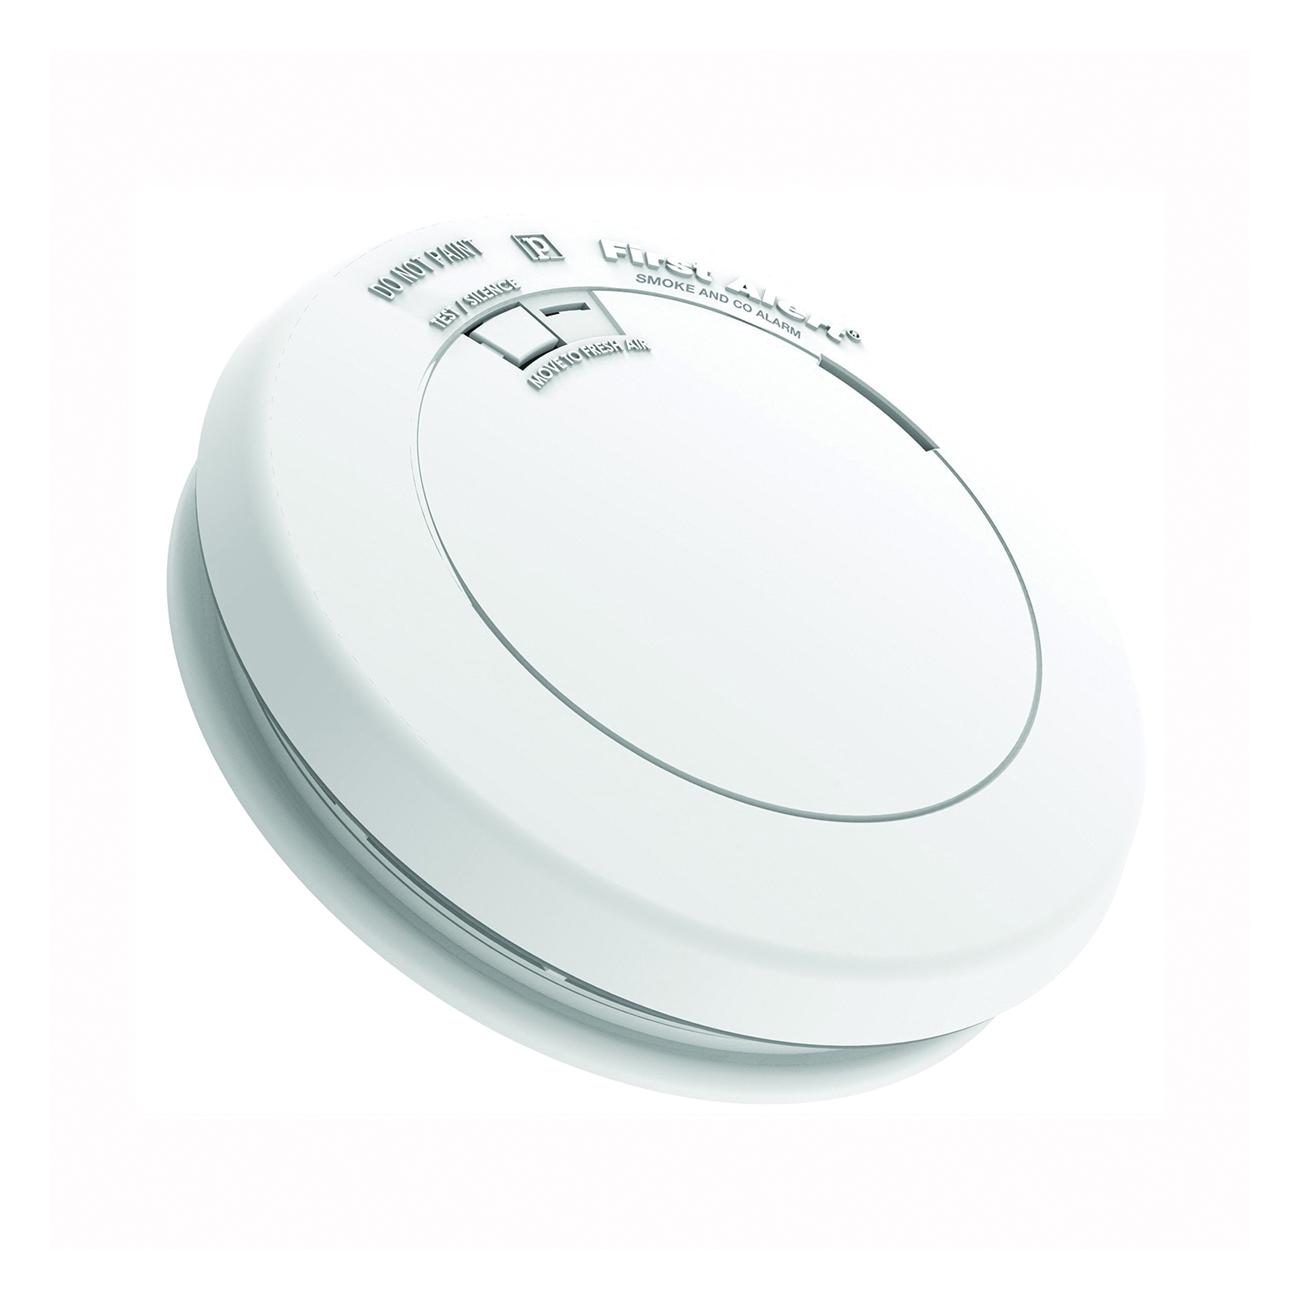 Picture of FIRST ALERT PRC700 Carbon Monoxide Alarm, 85 dB, Alarm: Audible, Electrochemical, Photoelectric Sensor, White